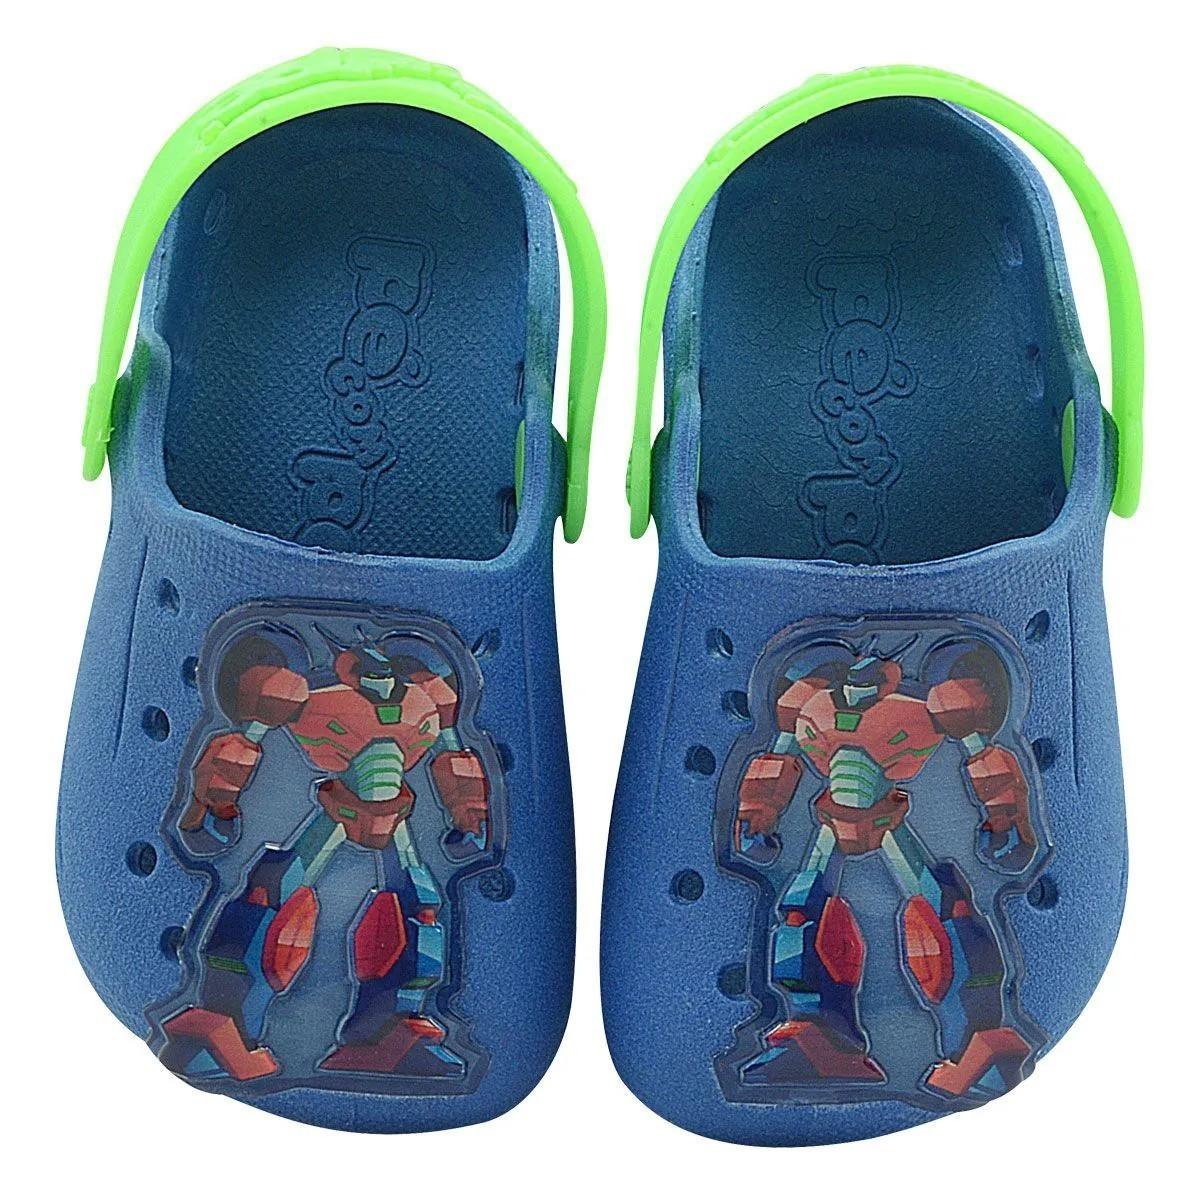 Babuche Infantil Robô Azul Royal e Verde Masculino